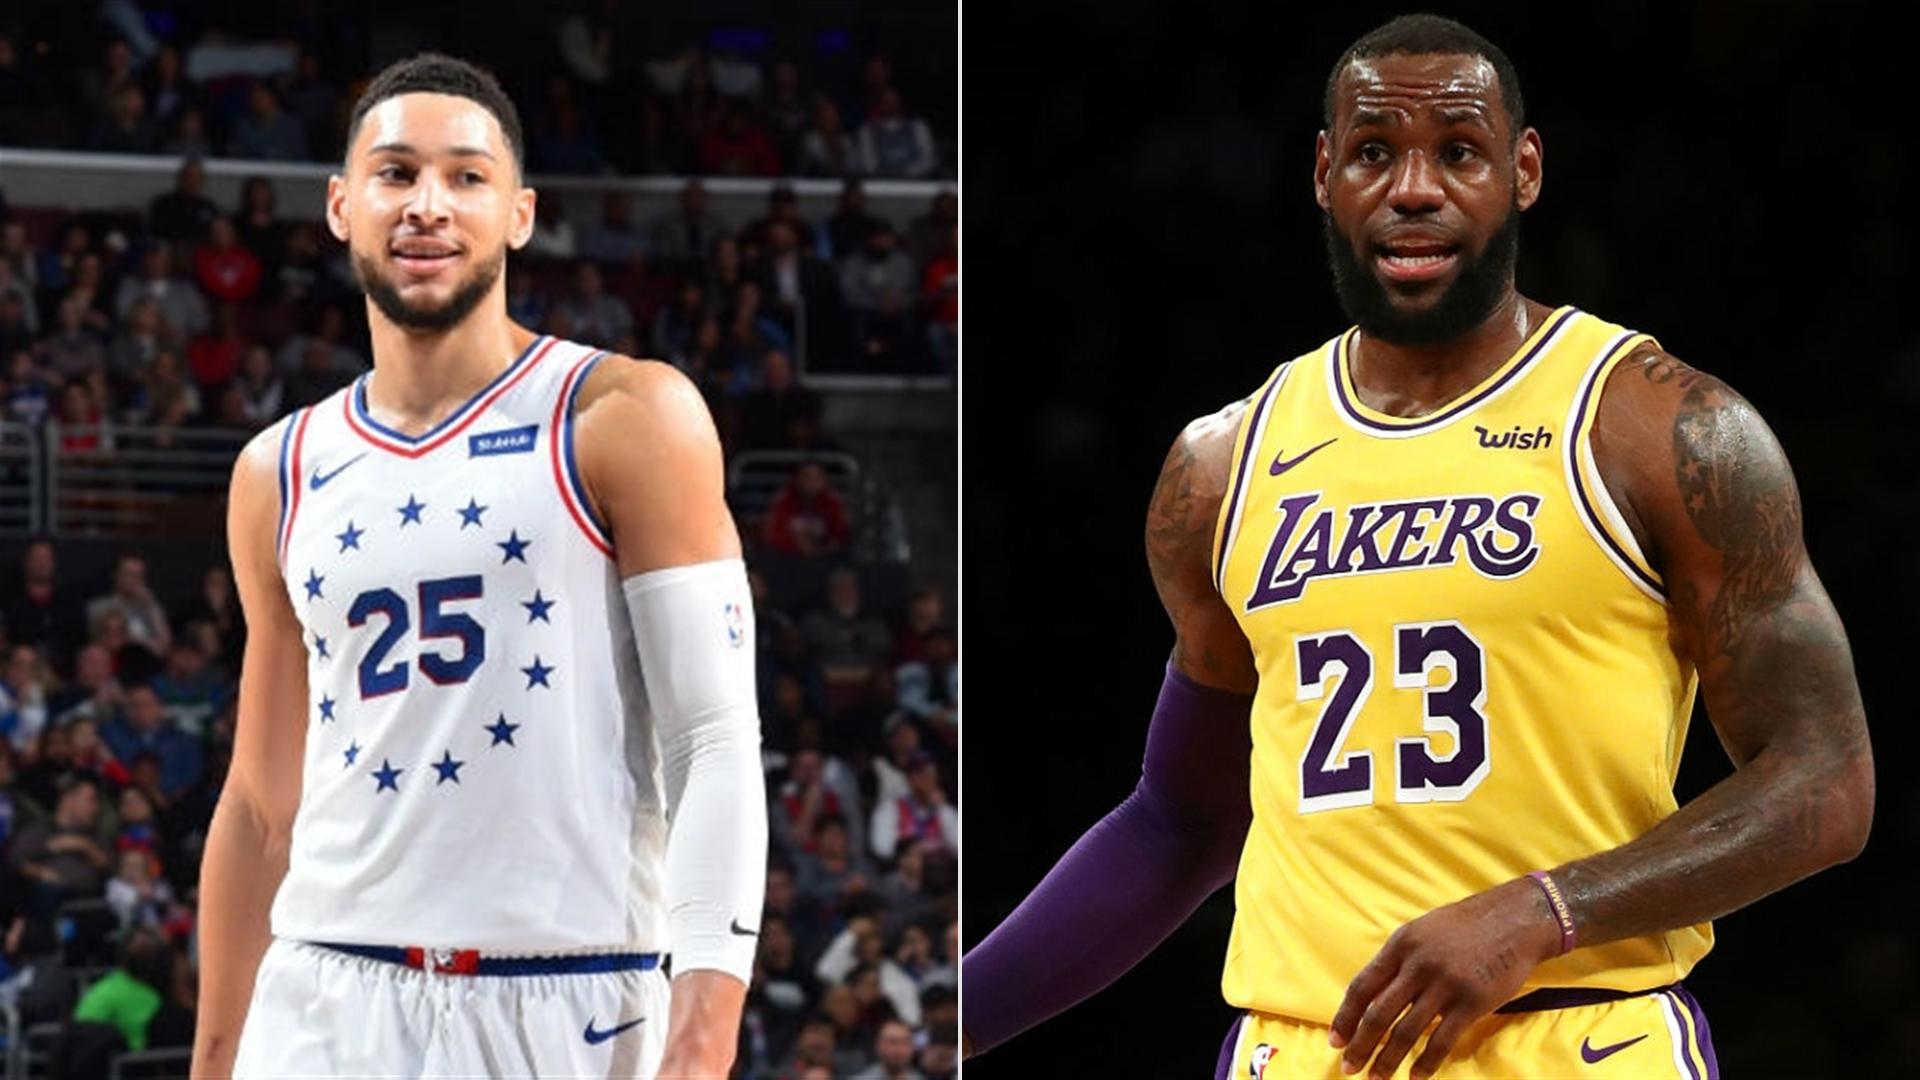 LeBron James tops NBA s best selling jersey for 2018 19 in Australia ... ba18b4423